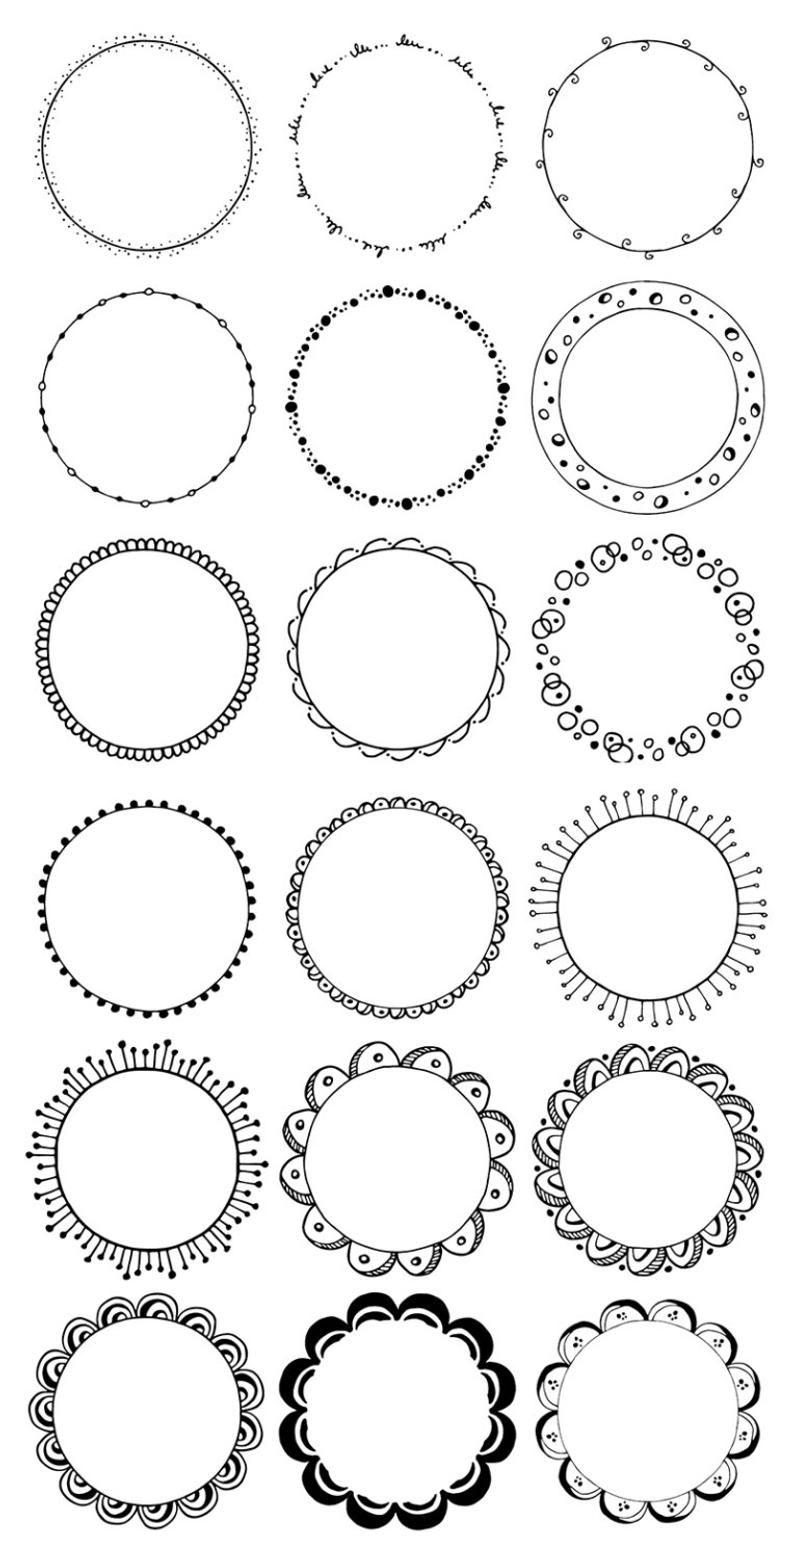 Round frames clipart. Hand drawn circles clipart. Floral.